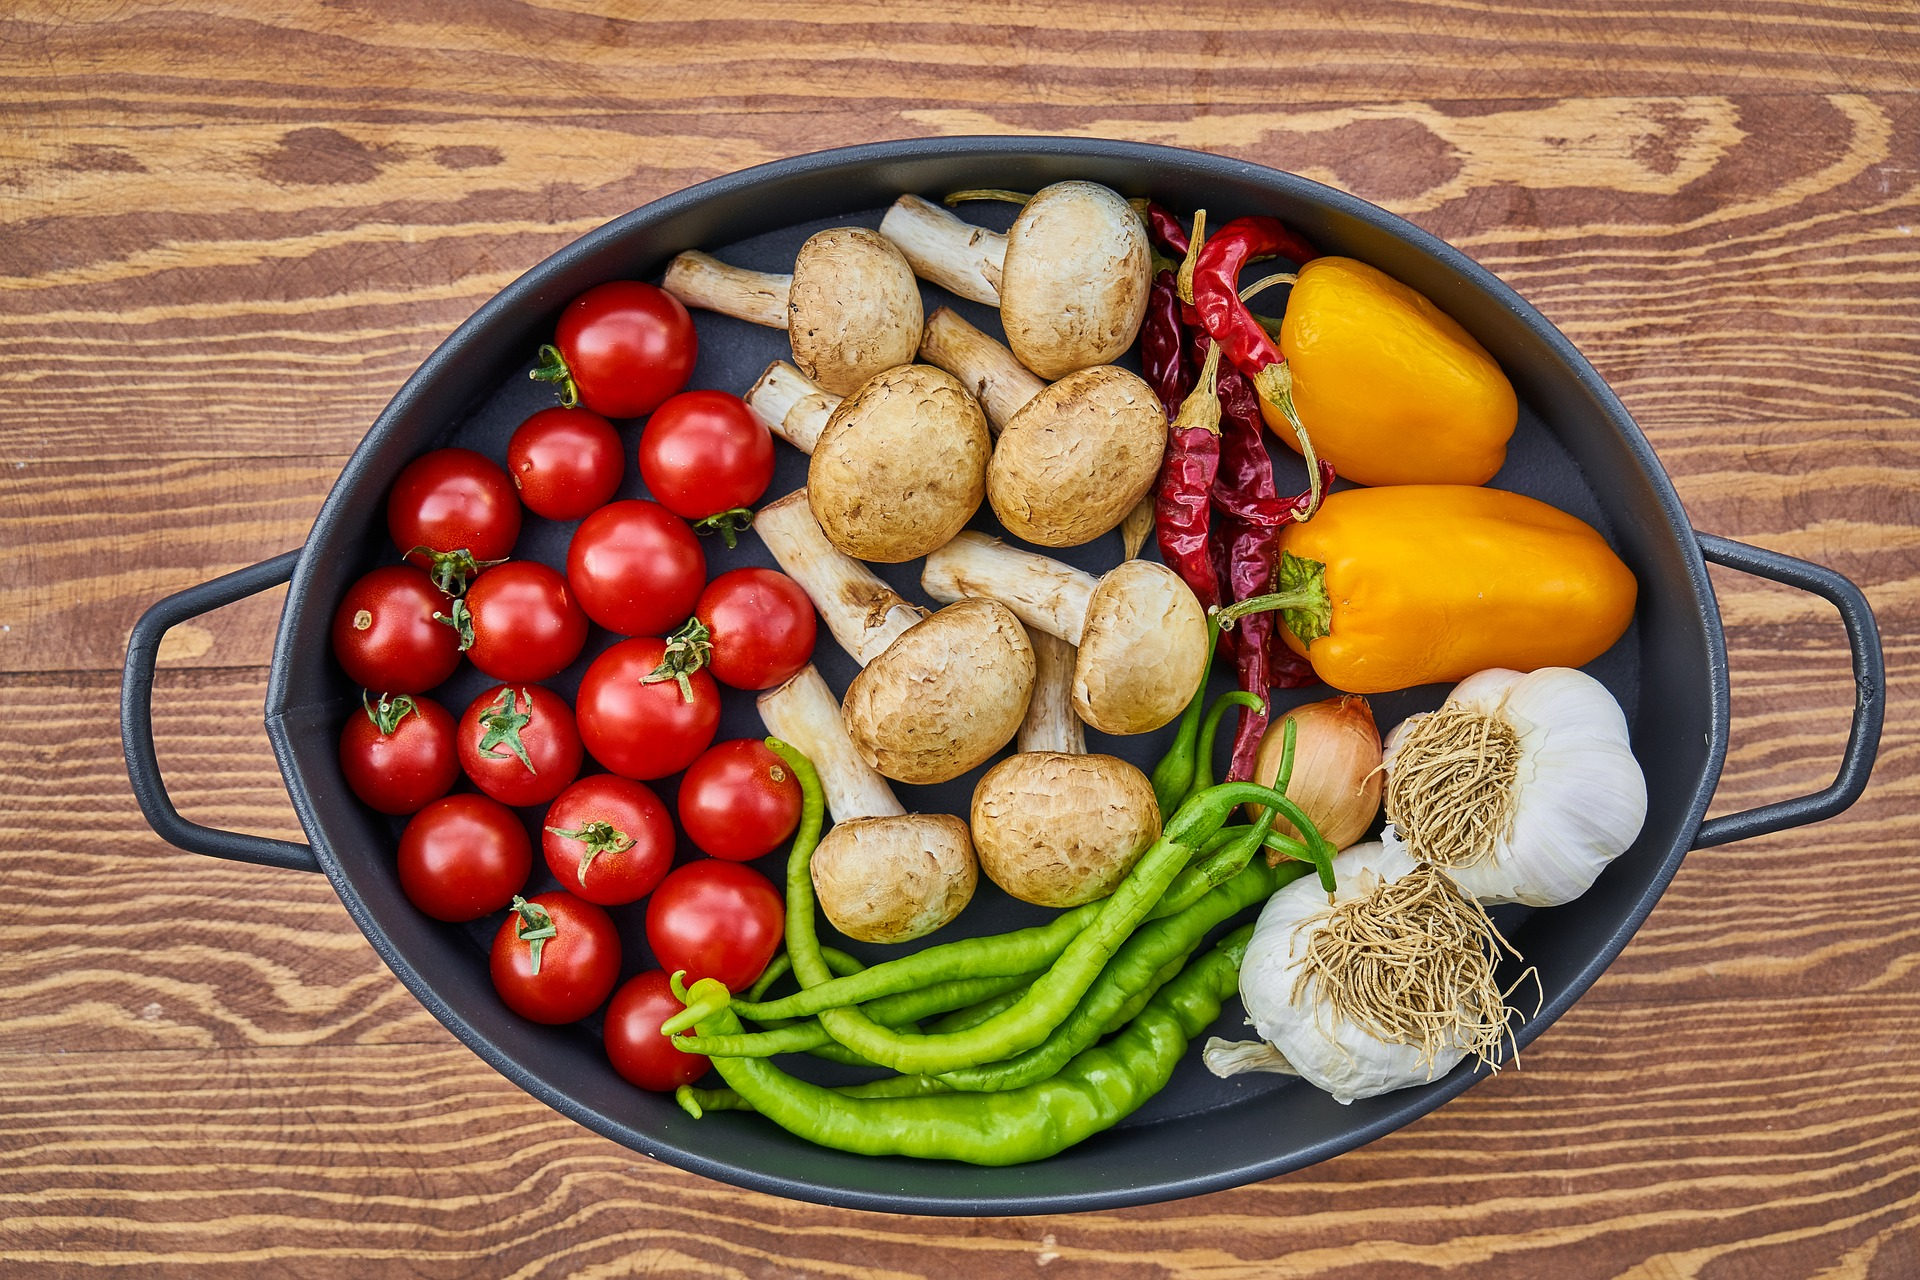 Organic Produce -